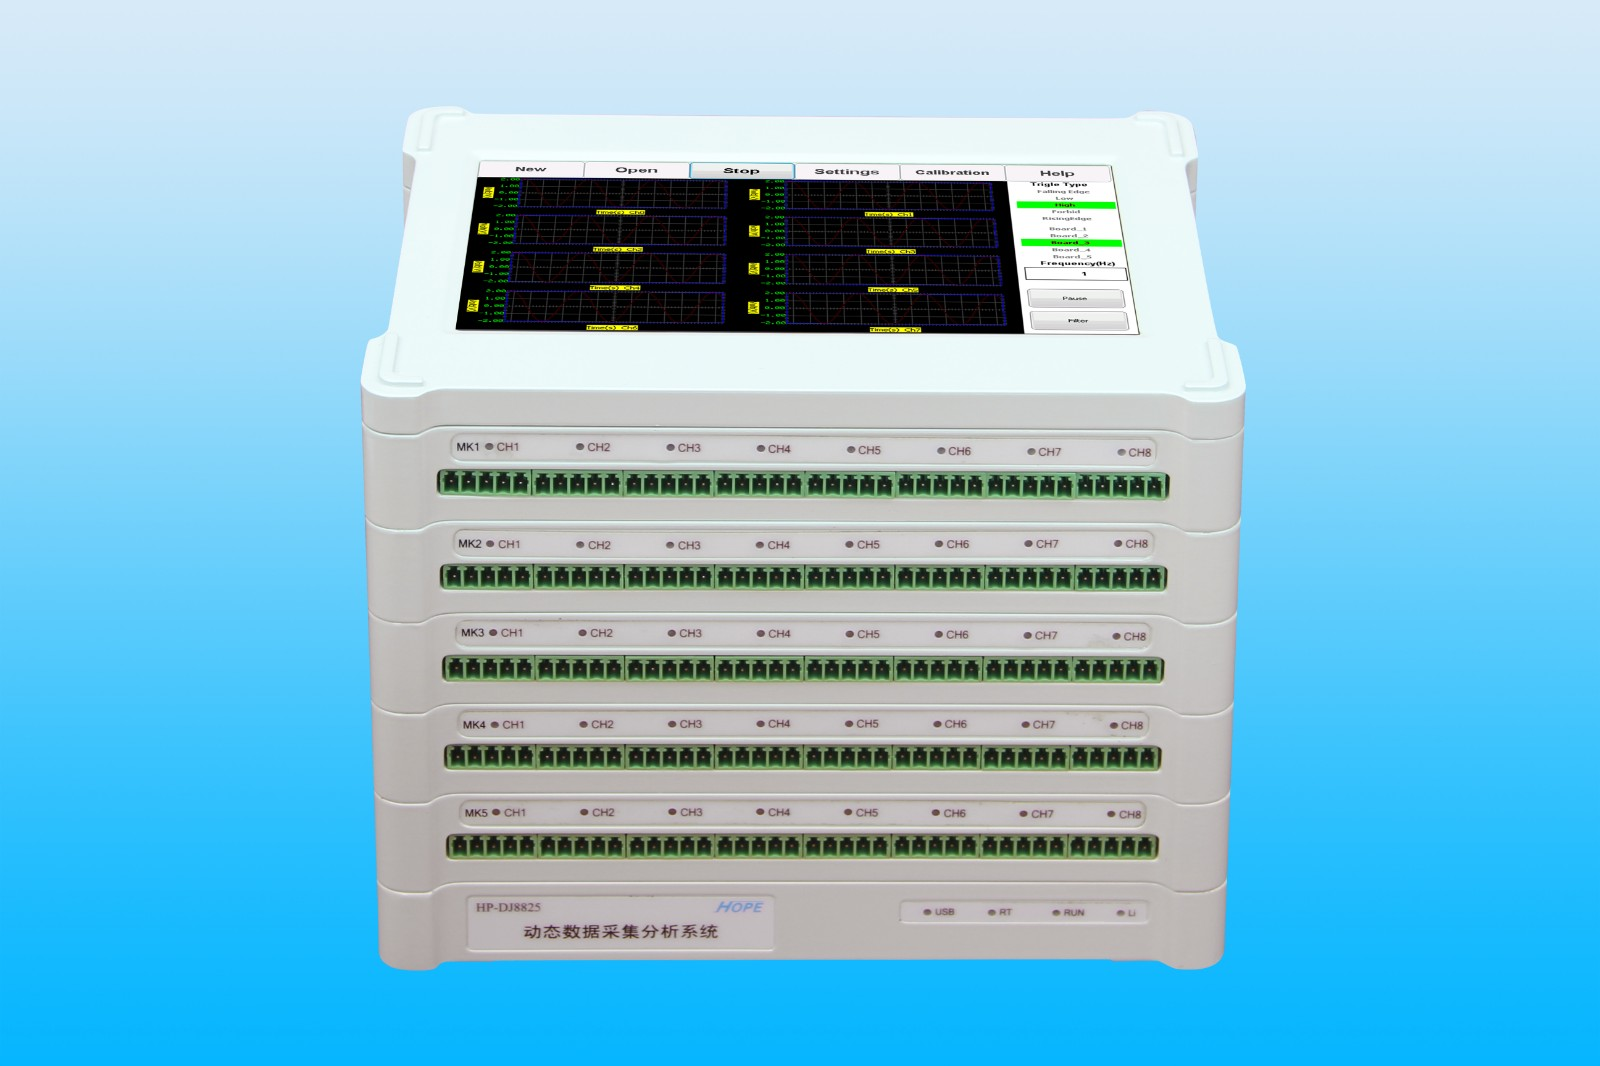 HP-DJ8525M 动态信号测试分析系统